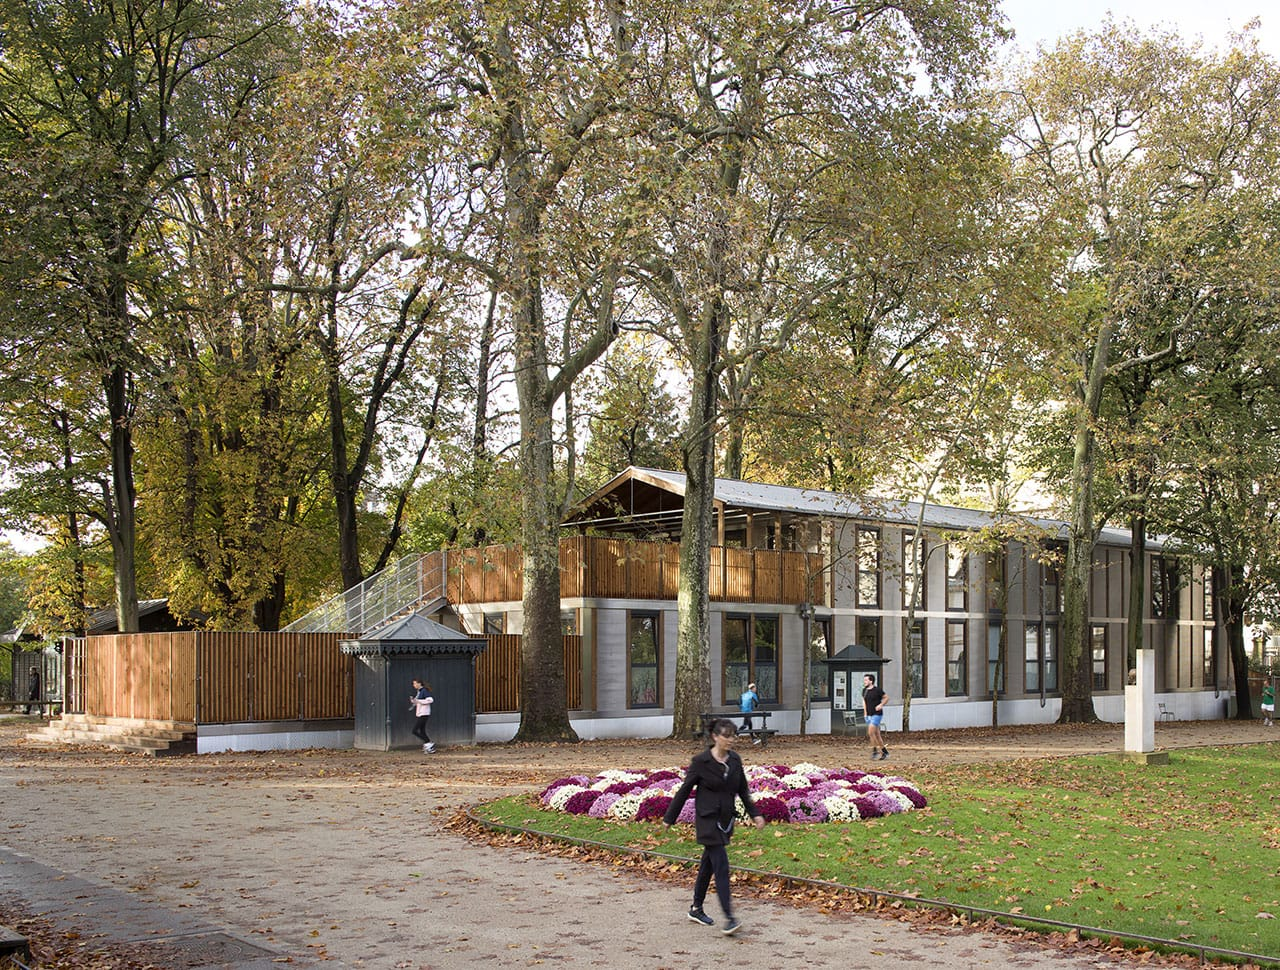 Modular and nomadic building by Djuric Tardio architectes